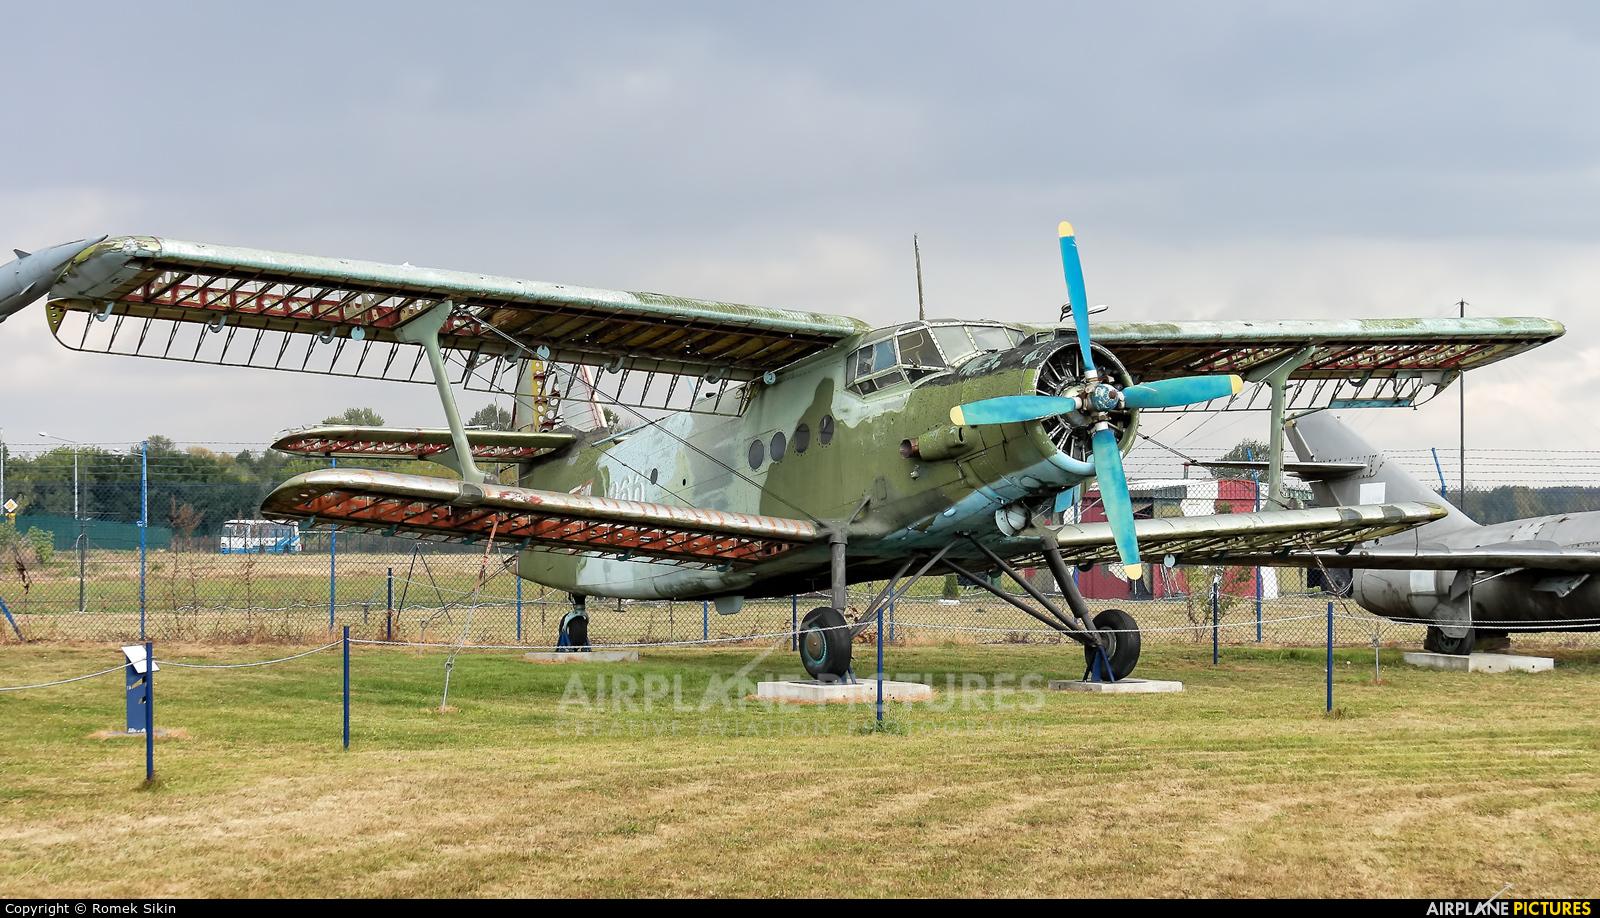 Poland - Air Force 9866 aircraft at Dęblin - Museum of Polish Air Force